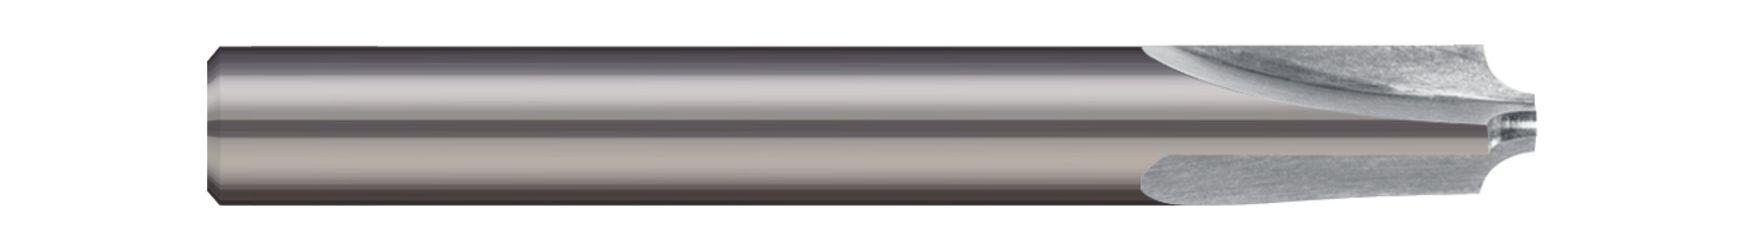 tool-details-CREM-060-150